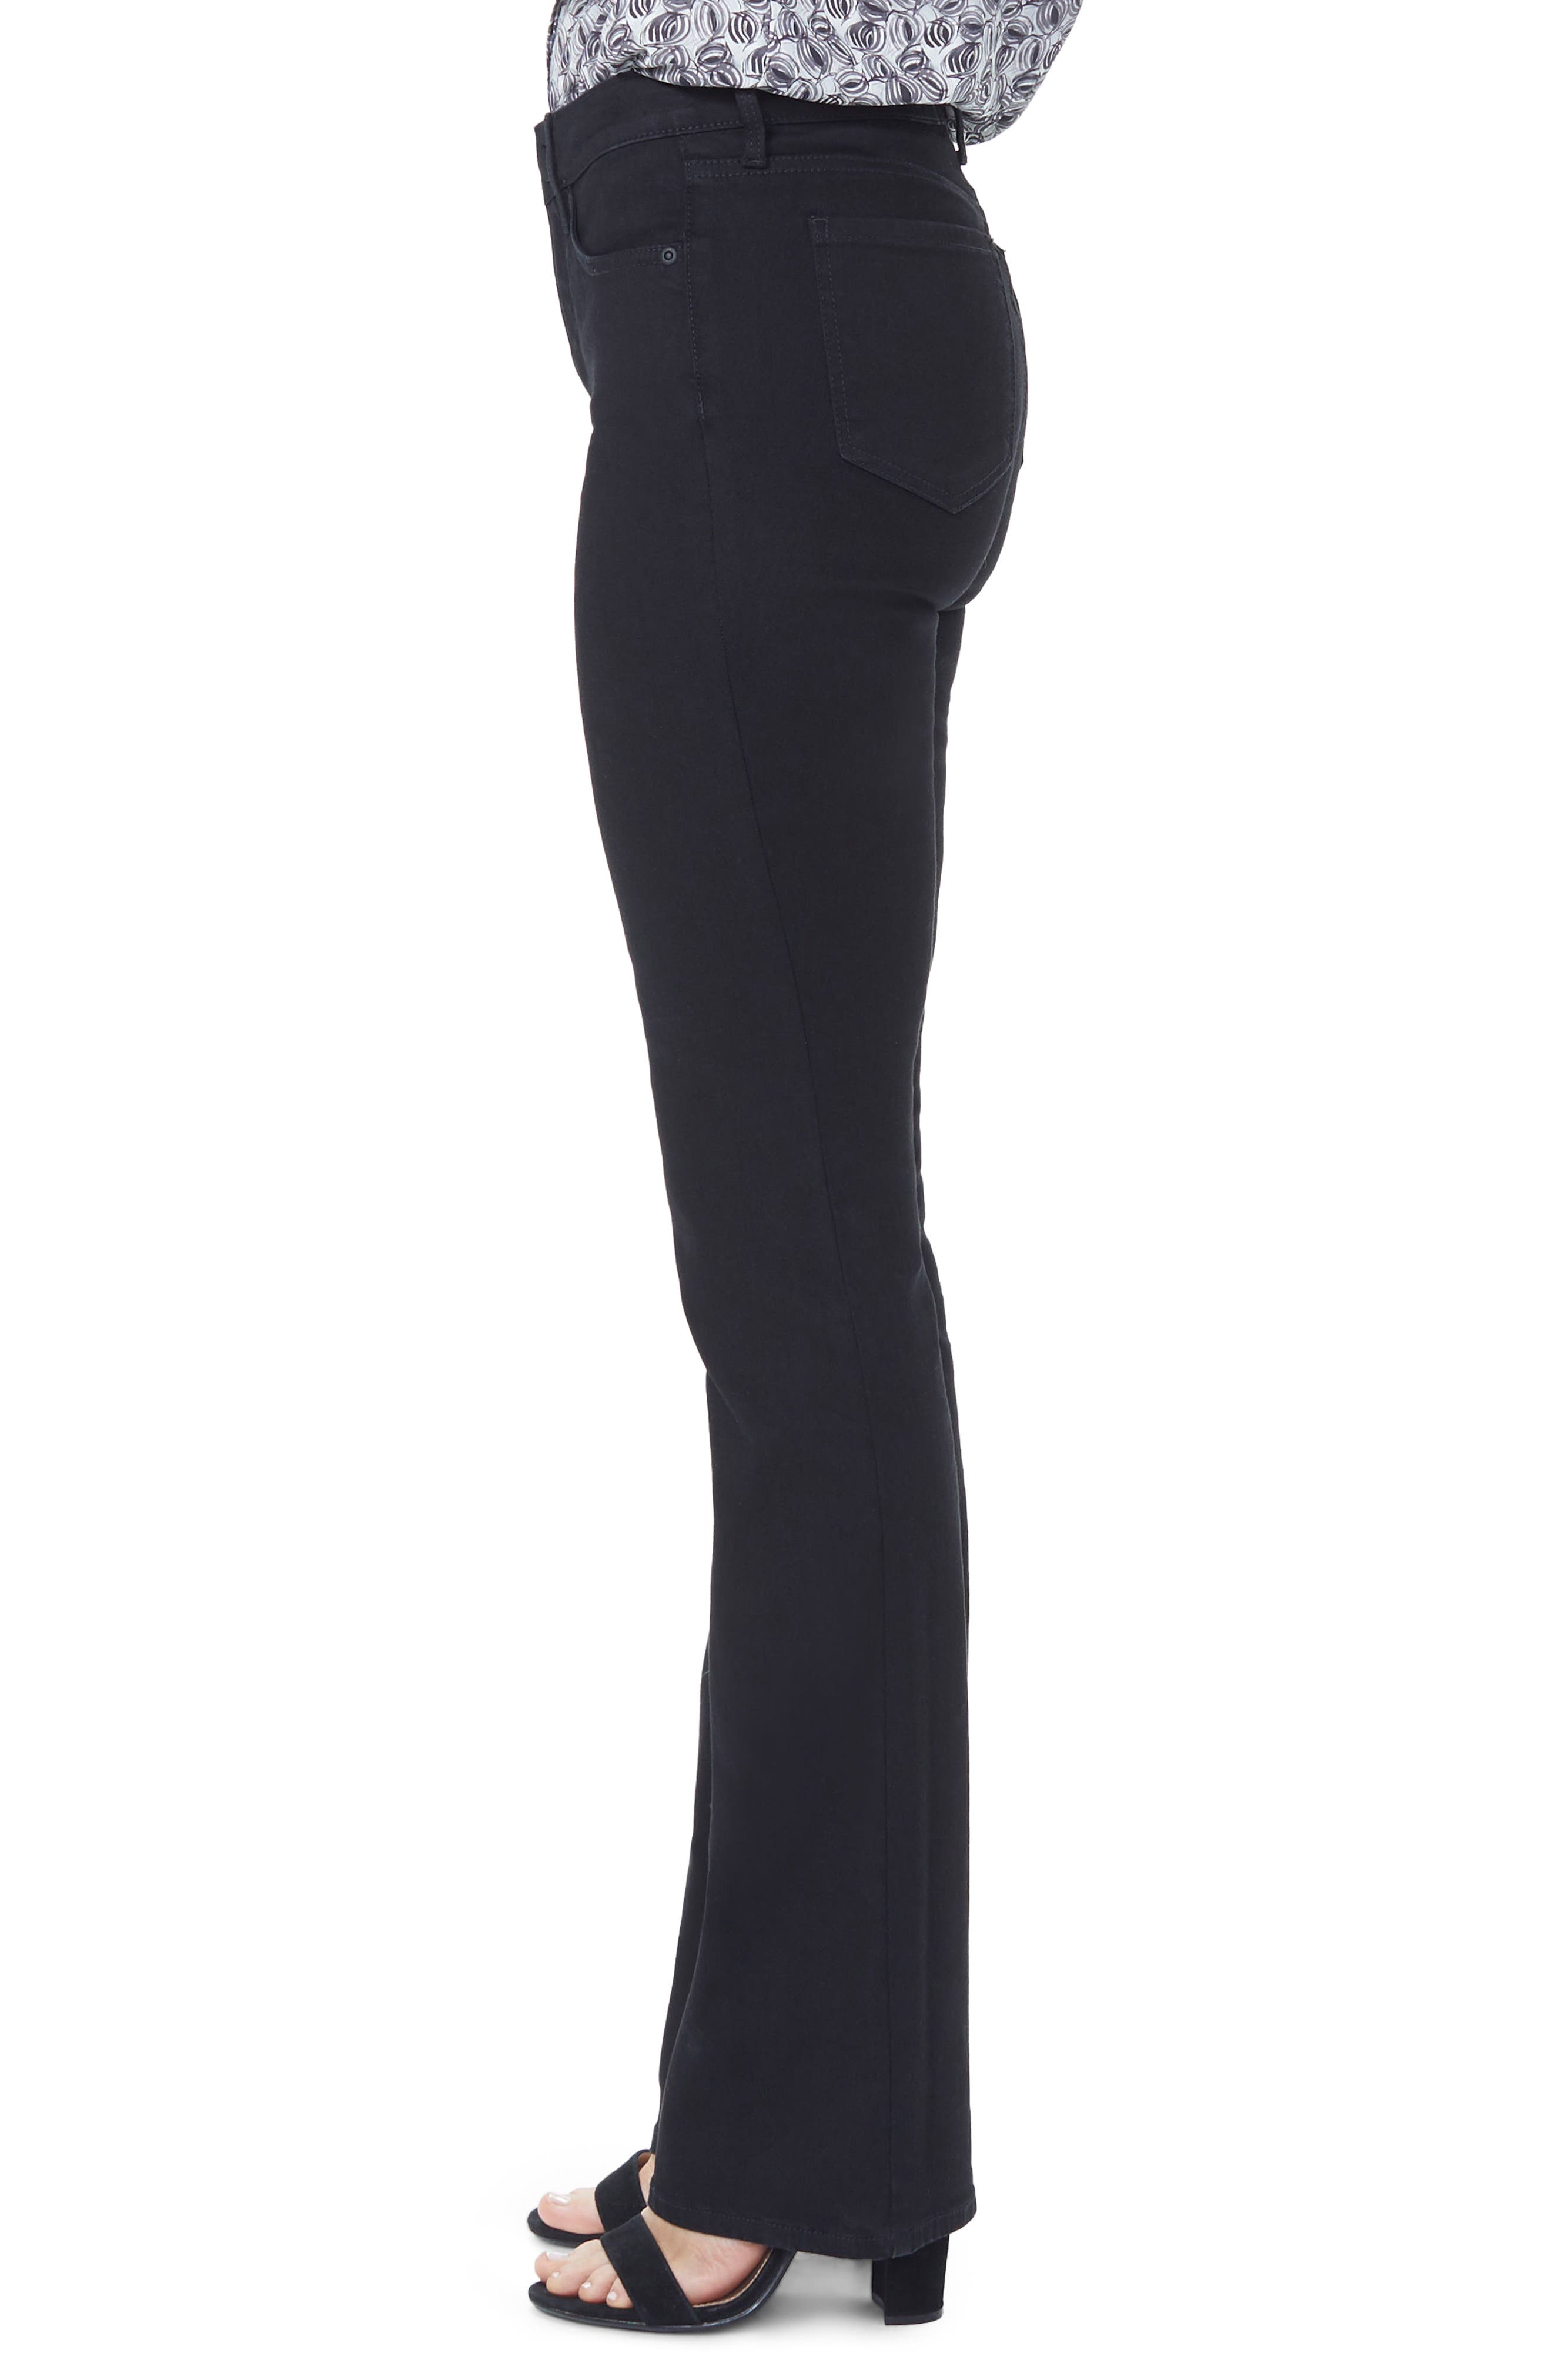 Barbara High Waist Stretch Bootcut Jeans,                             Alternate thumbnail 3, color,                             BLACK